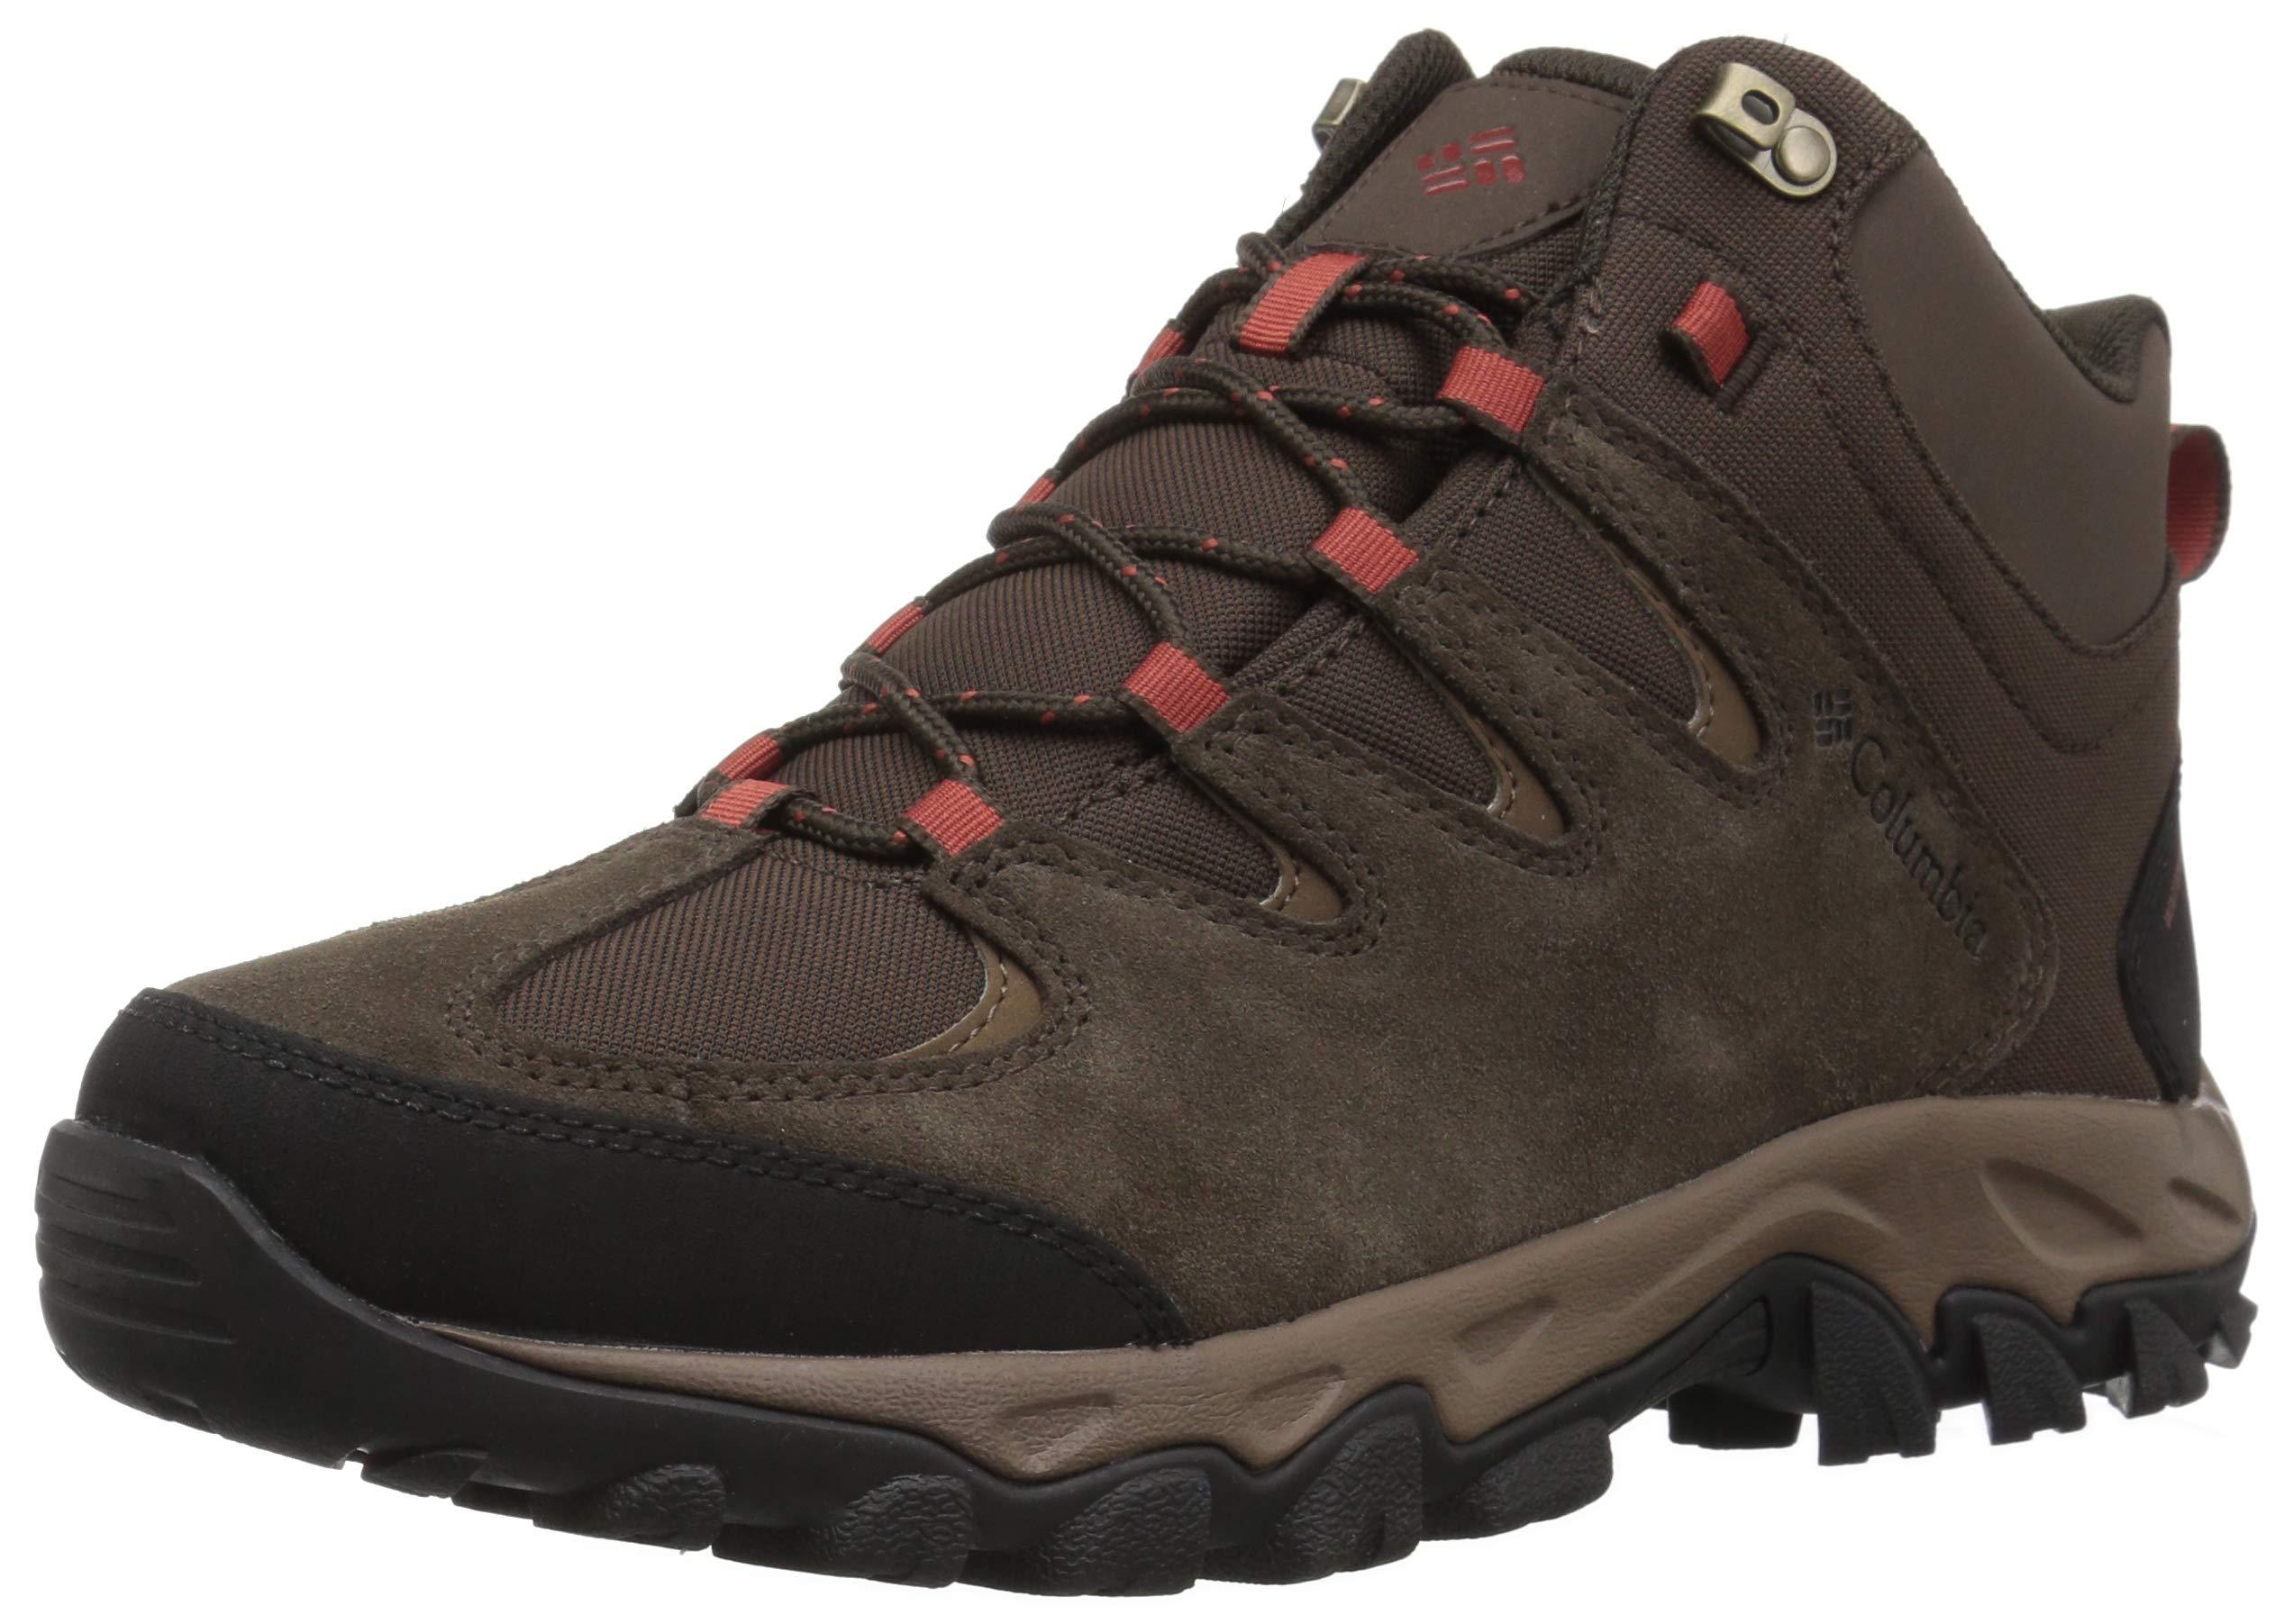 Columbia Men's Buxton Peak Mid Waterproof Hiking Boot, Cordovan, Rusty, 12 Wide US